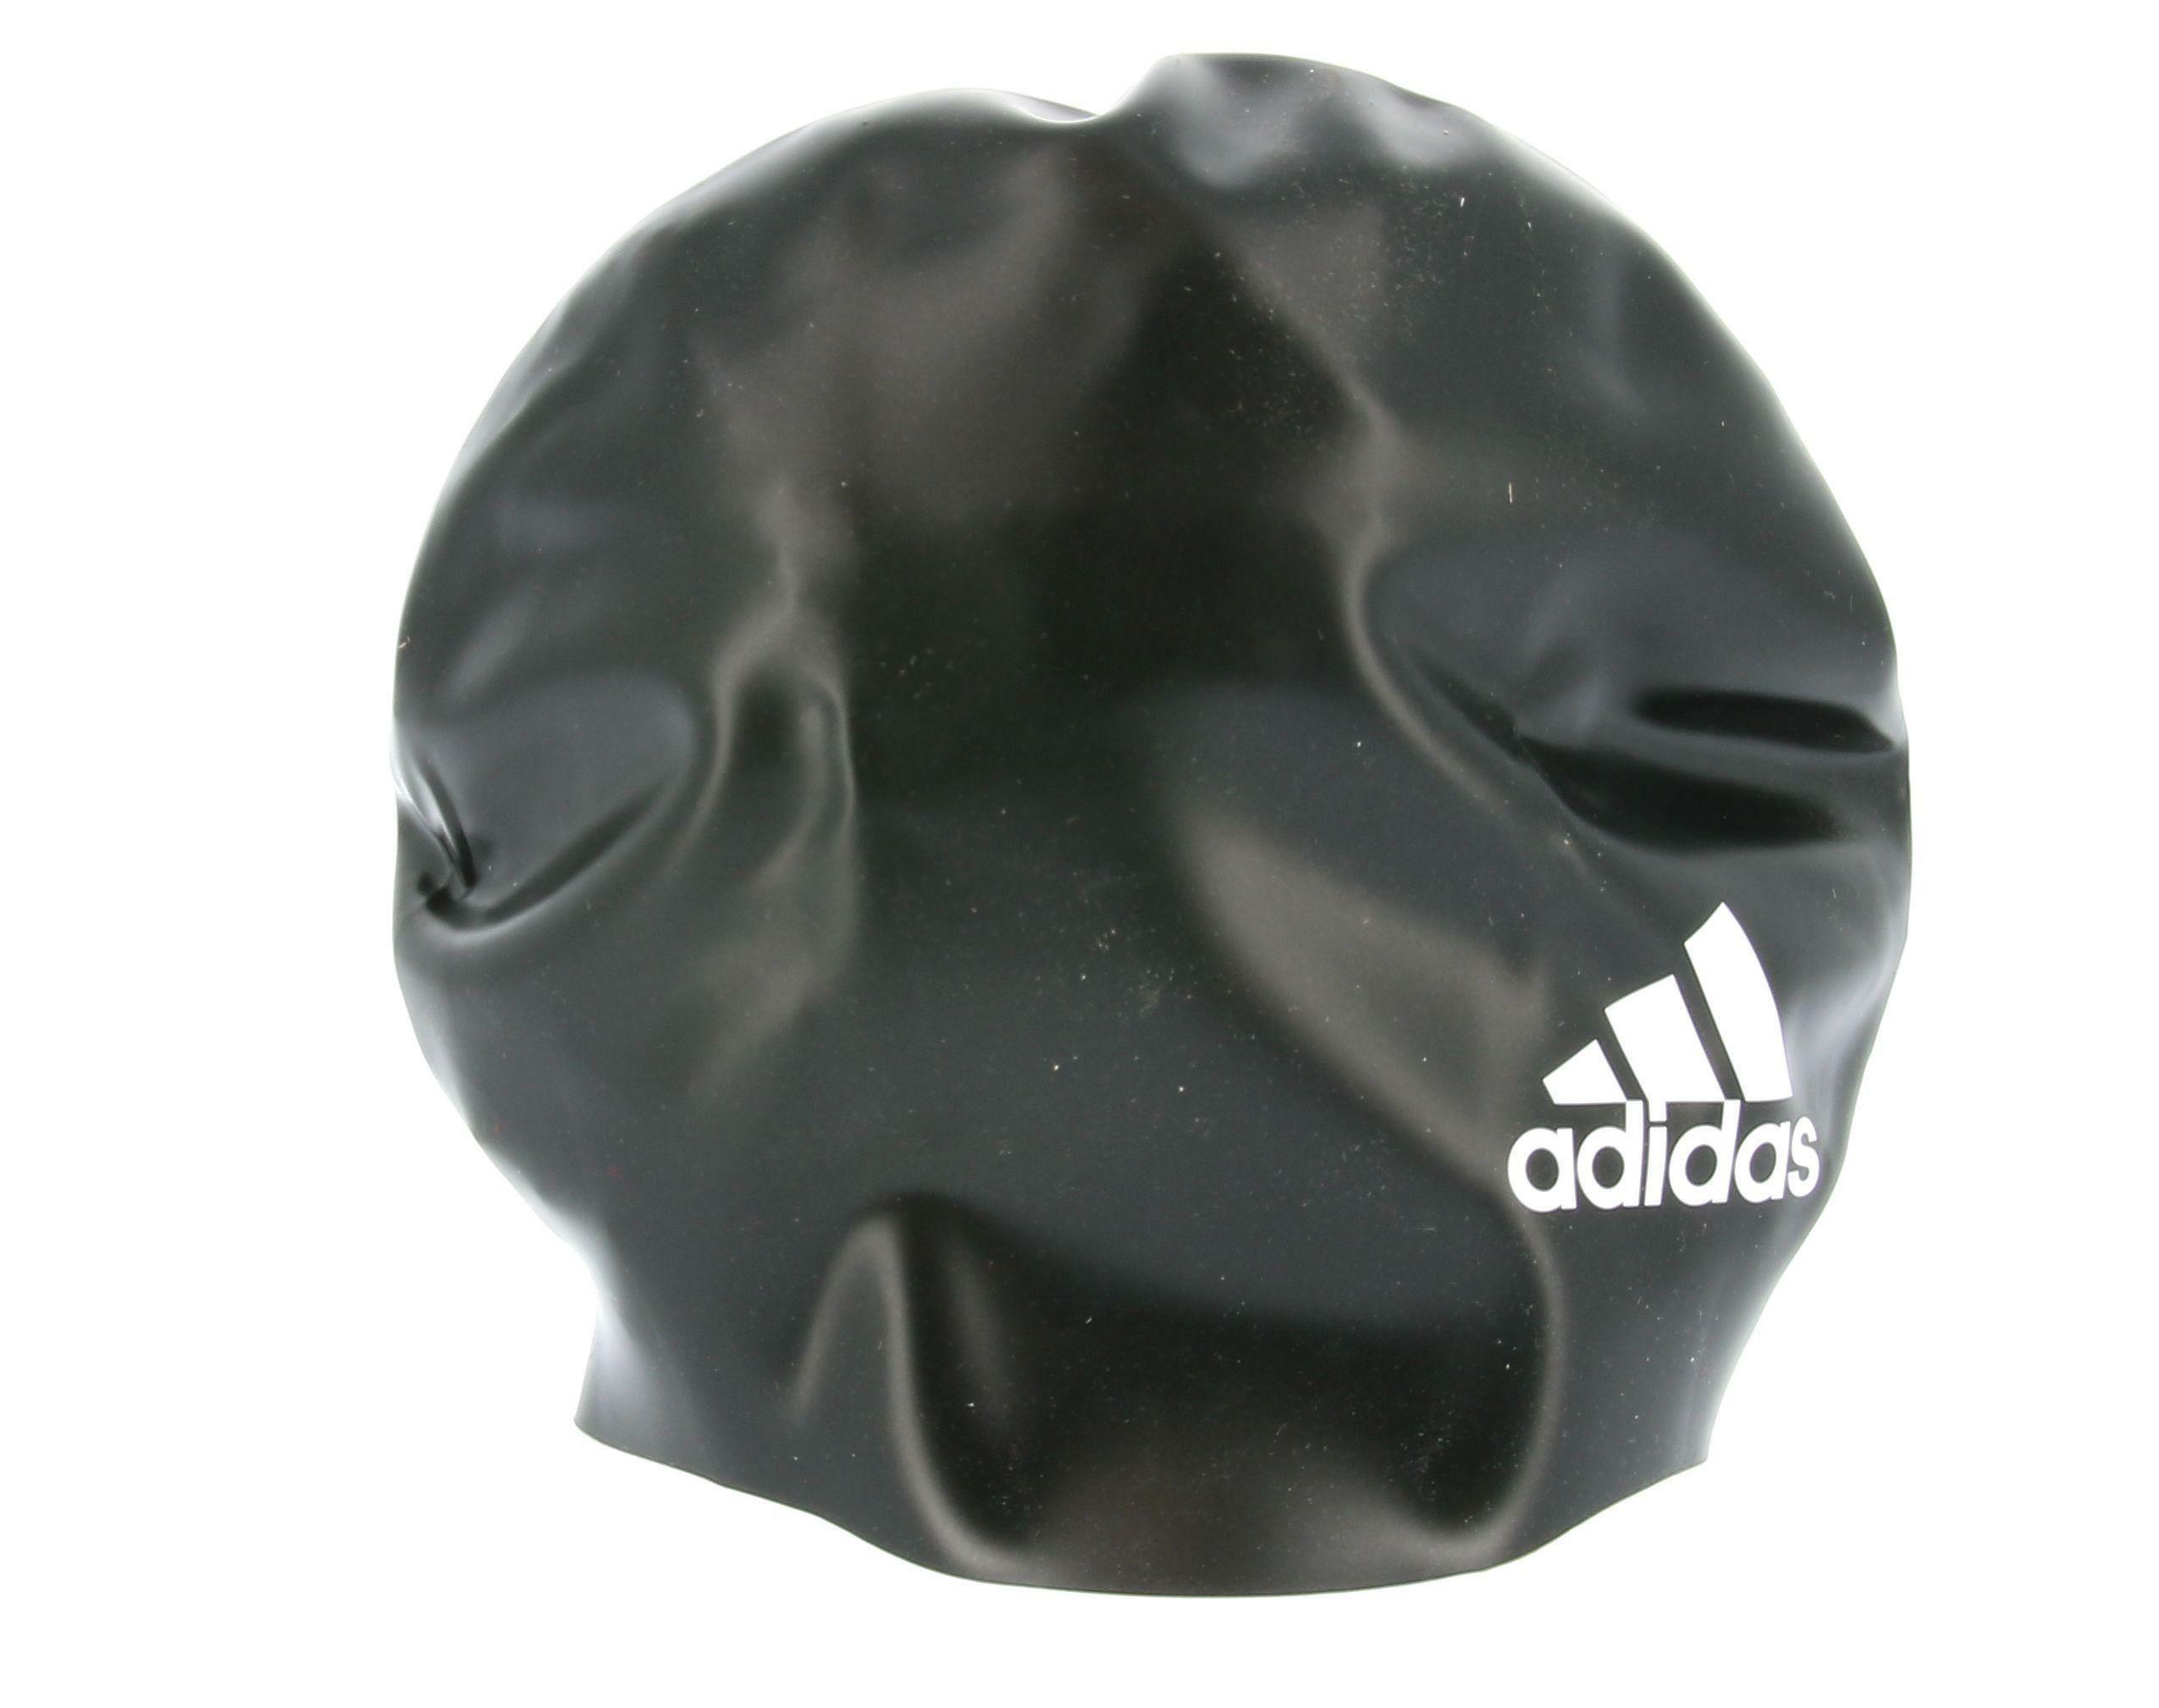 adidas adidas cuffia adidas sil cap logo, berretto unisex adulto fj4964 black